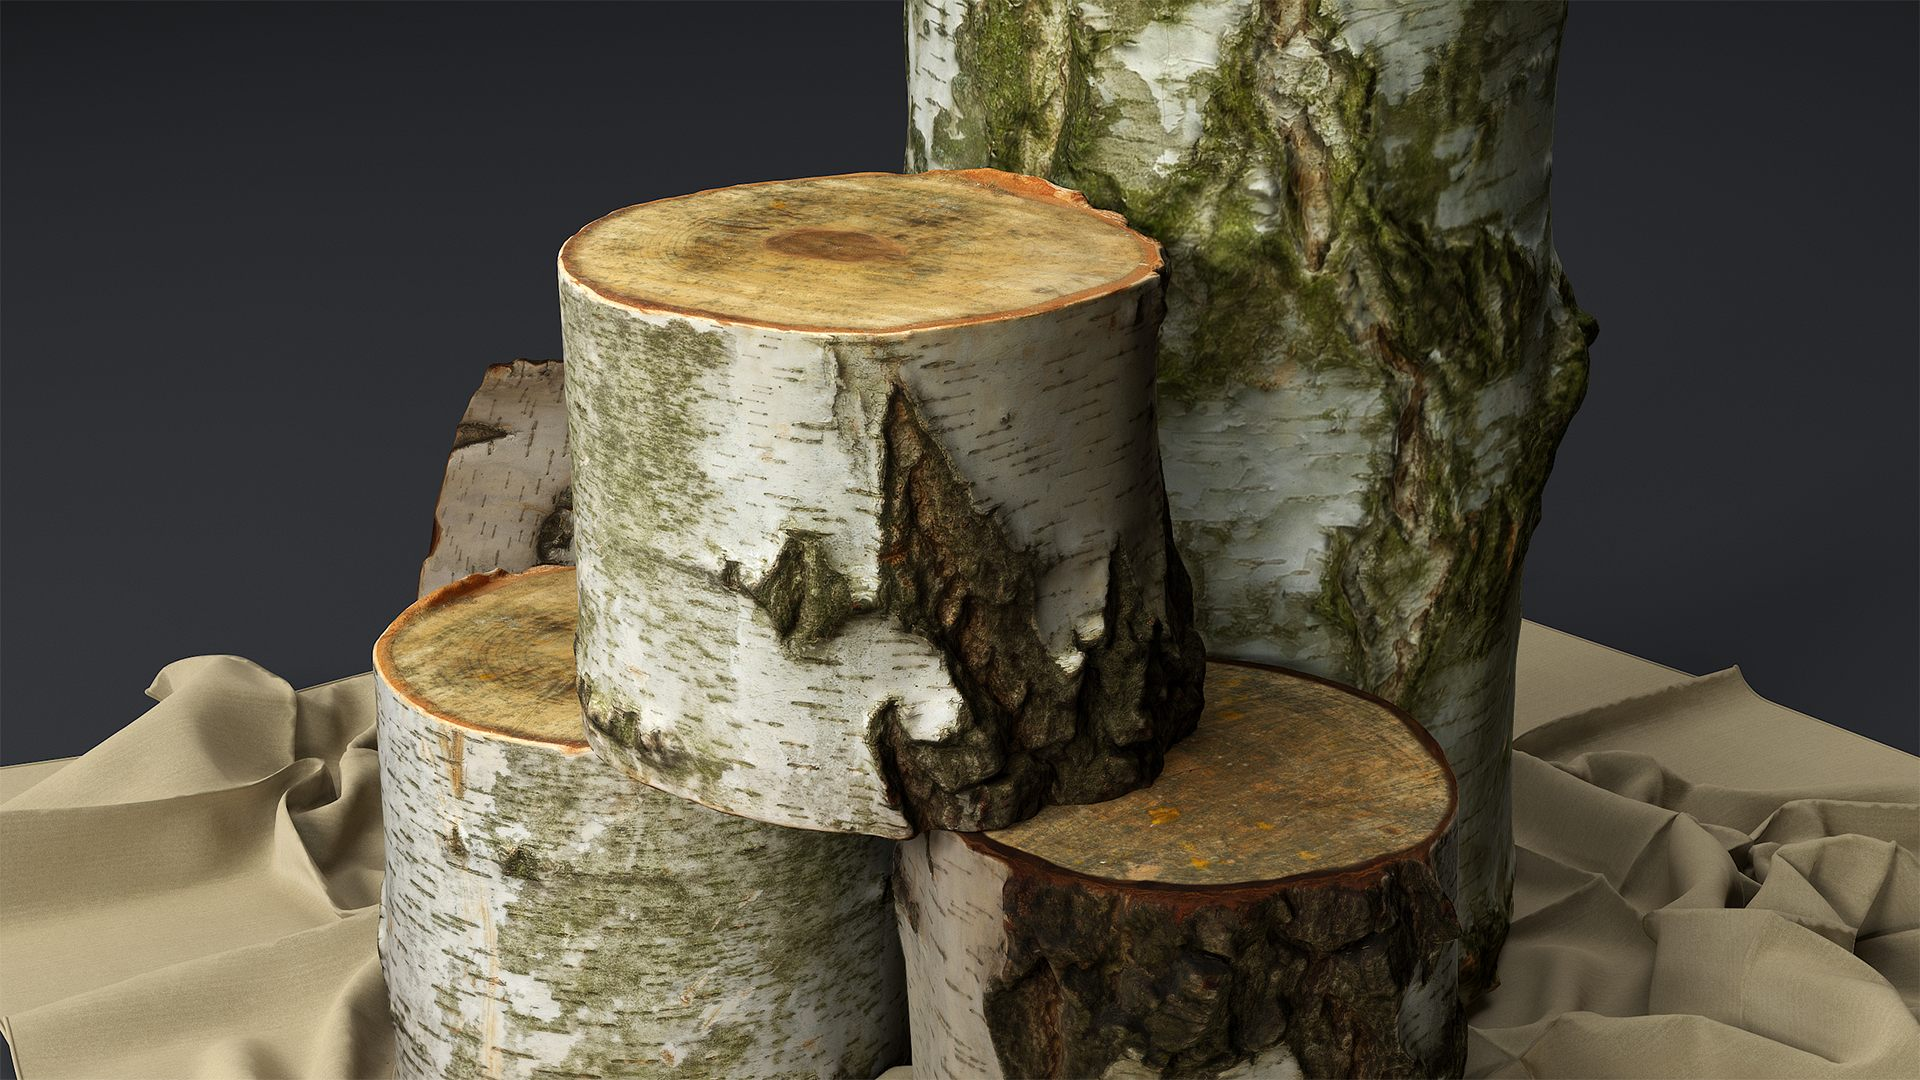 Decorative Birch logs